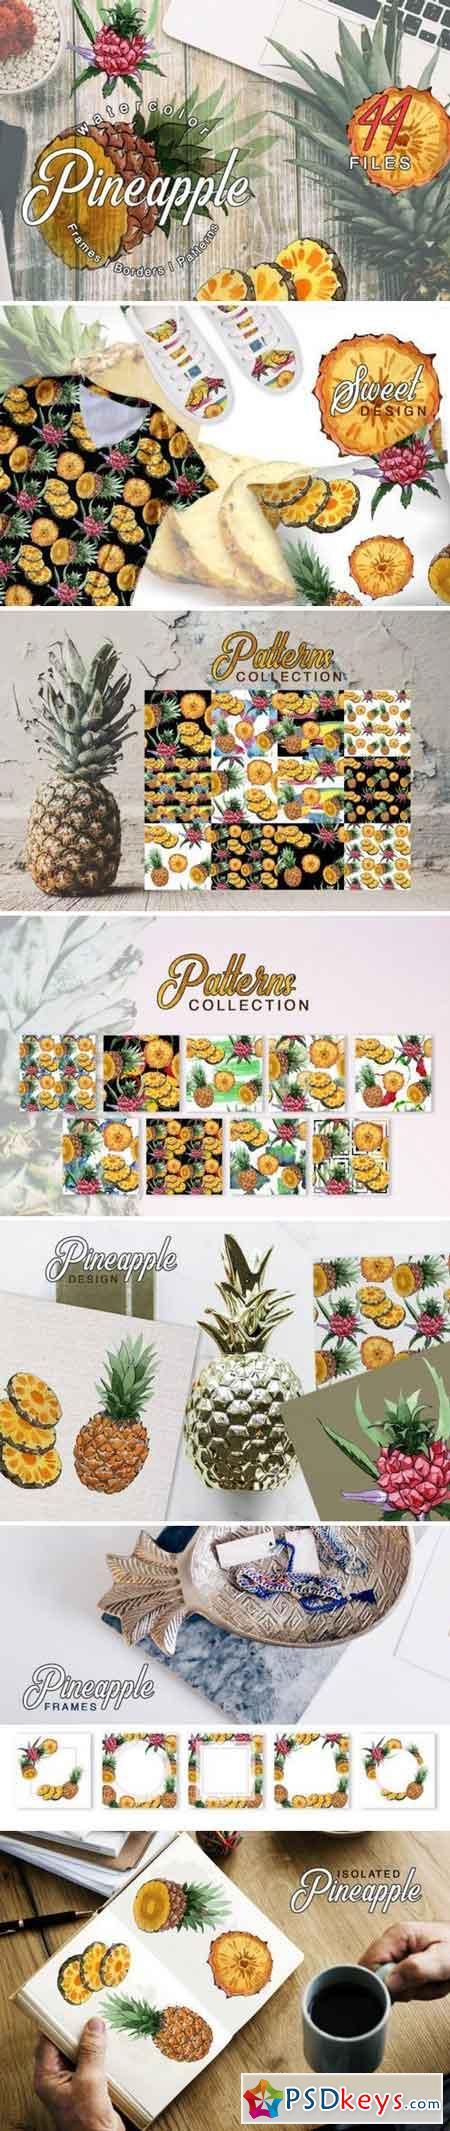 Pineapple Watercolor png 3358477